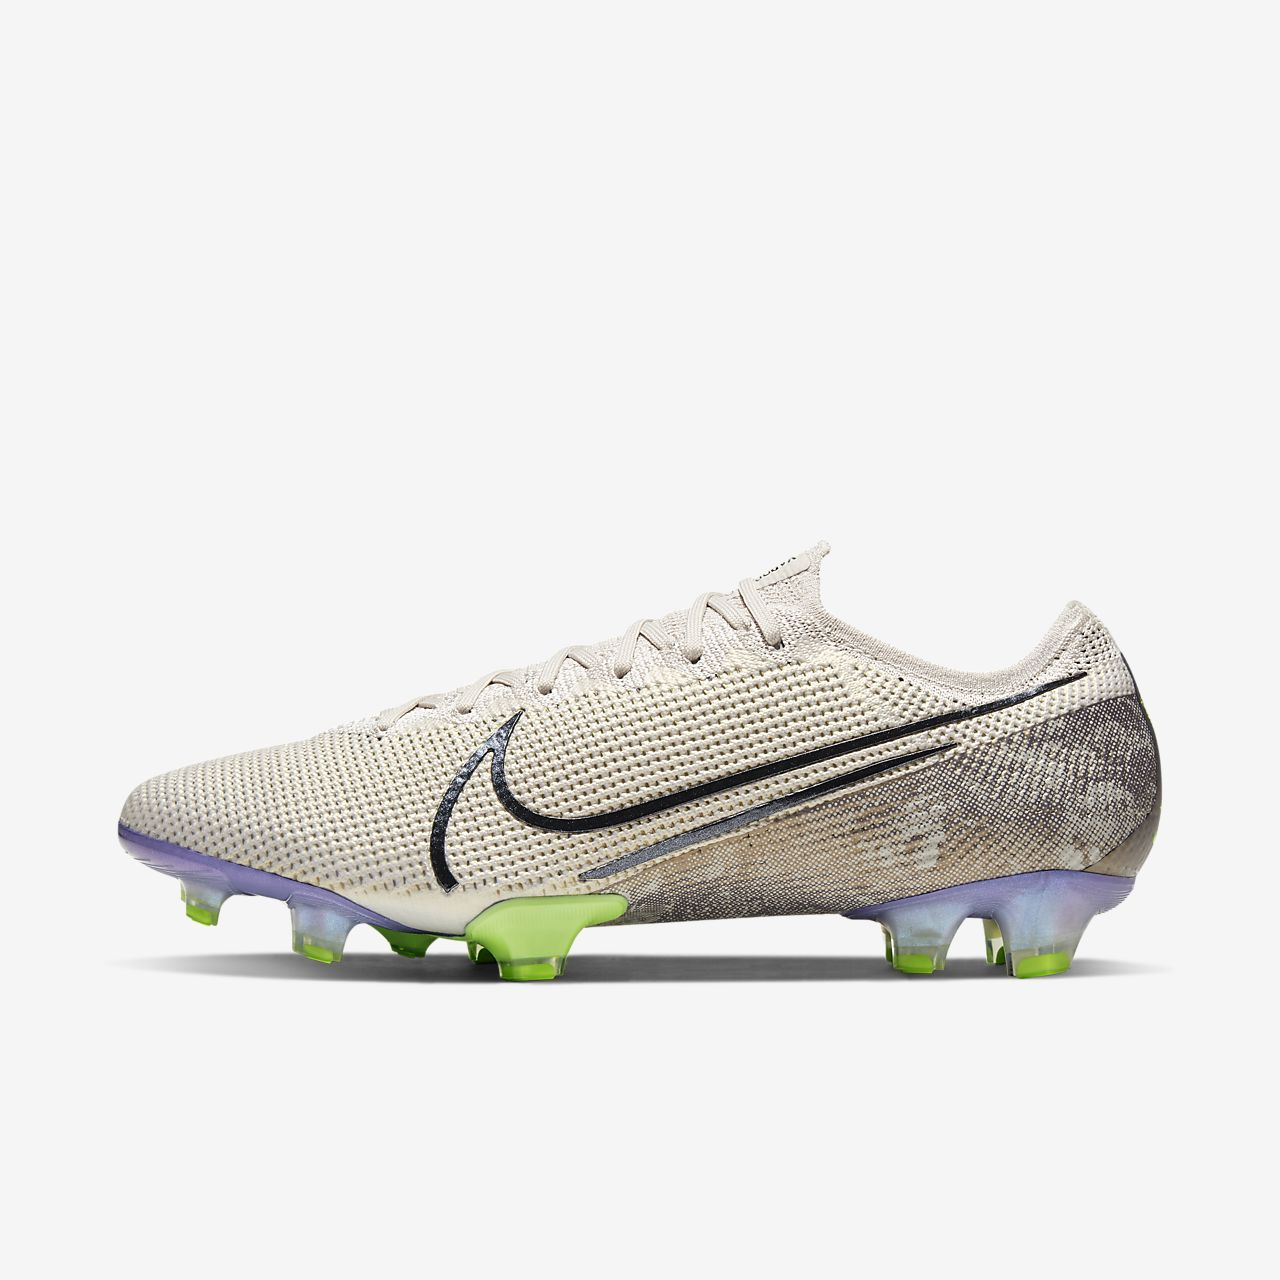 Scarpa da calcio per terreni duri Nike Jr. Mercurial Vapor 13 Elite FG Ragazzi